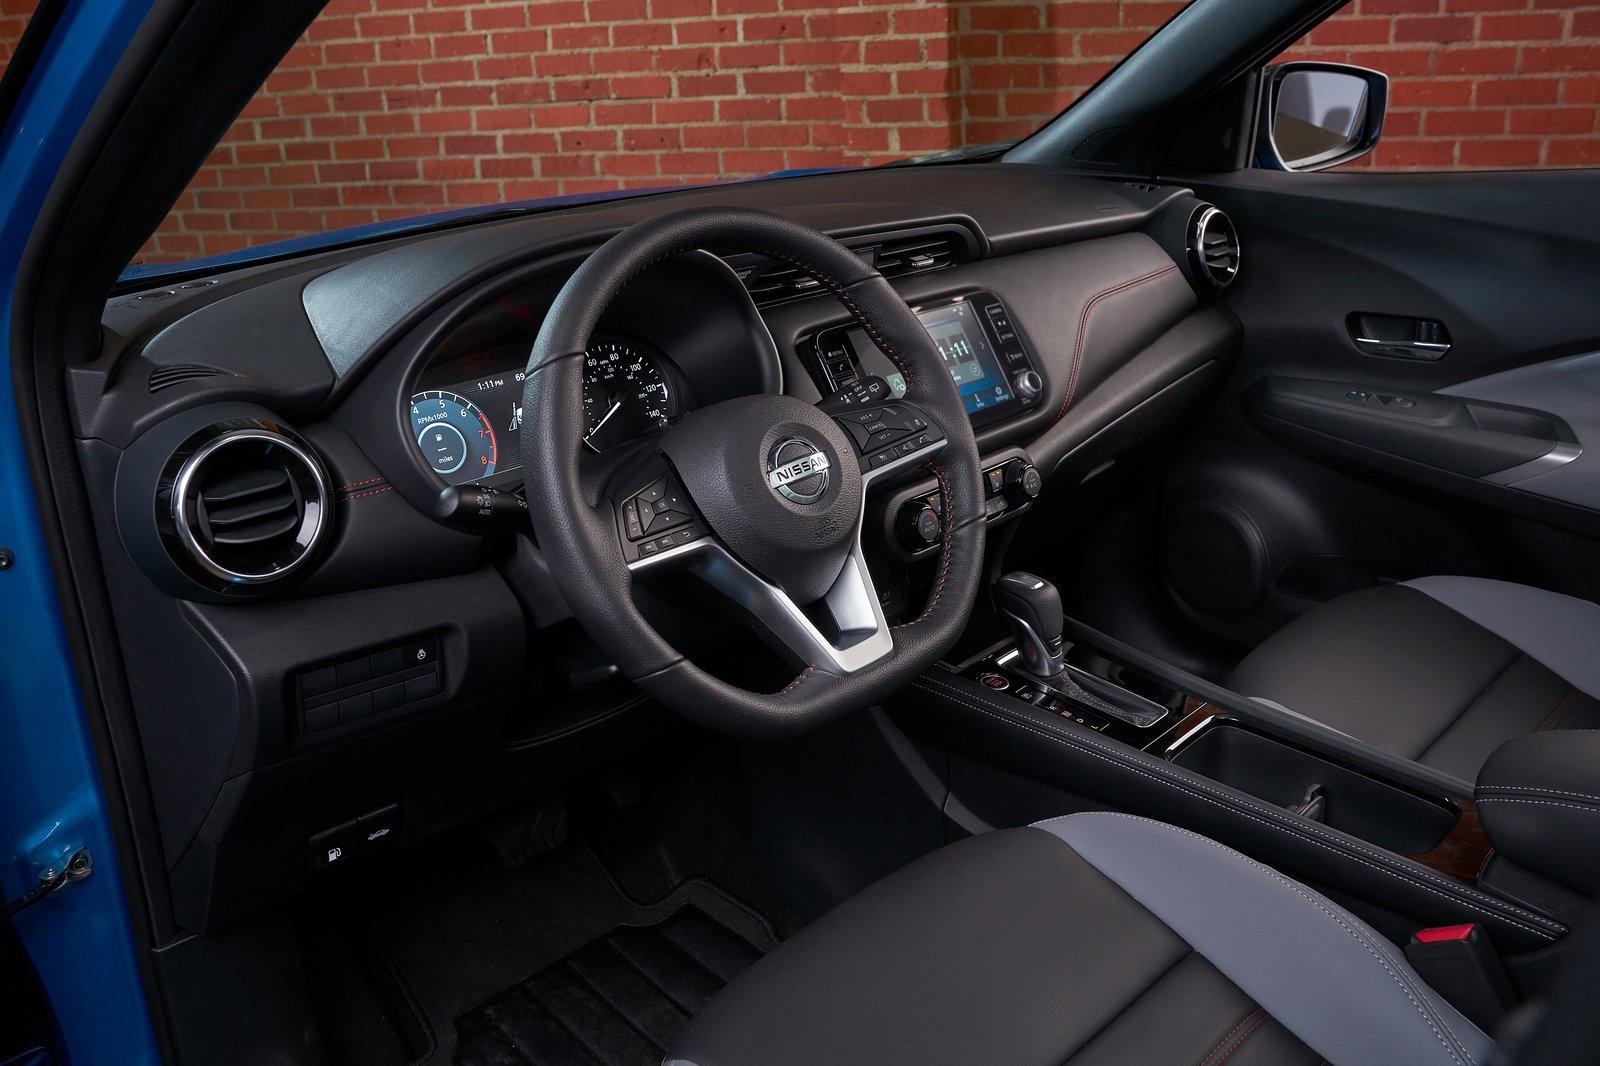 IMPRESSÕES DO KICKS 2022 EXCLUSIVE Nissan+Kicks+2022+painel+e+console